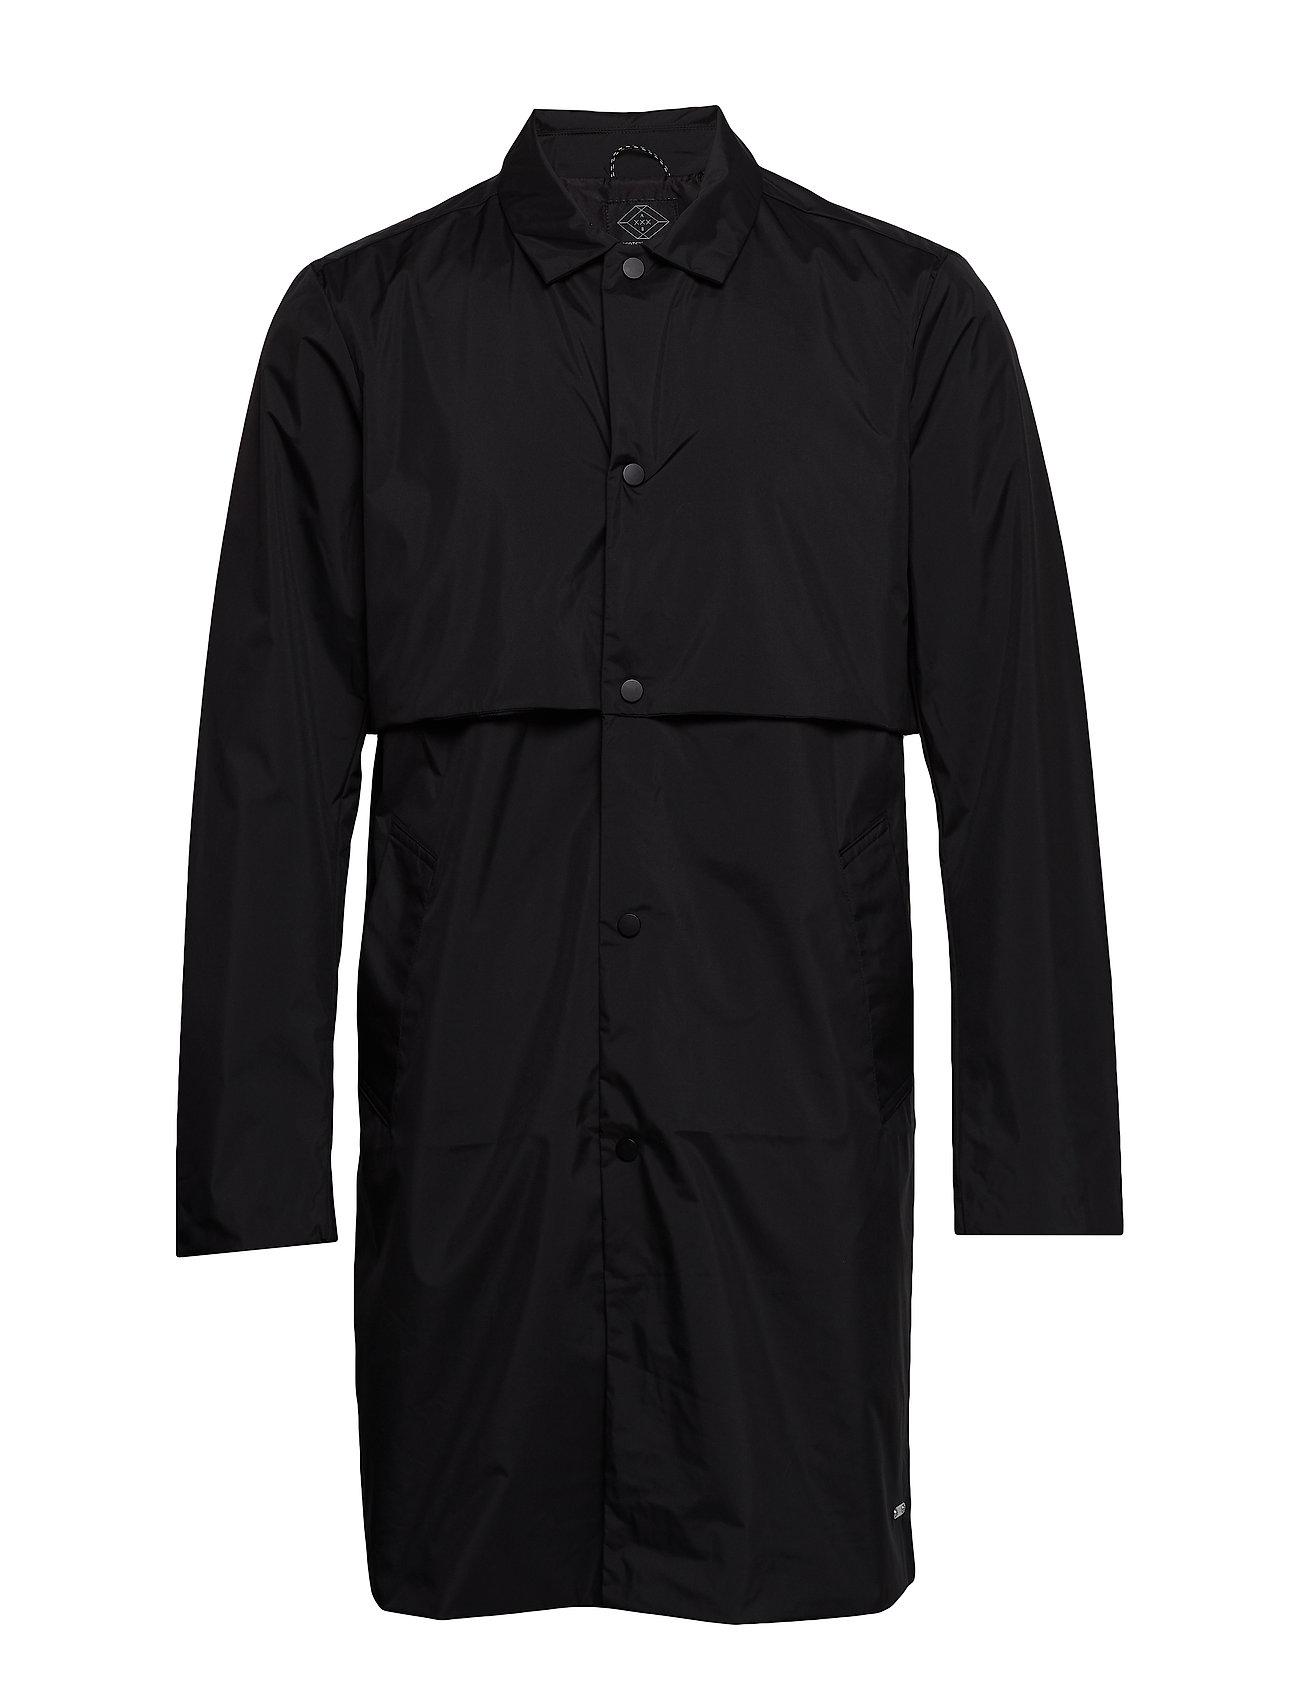 Image of Ams Blauw Clean Trenchcoat In Coated Quality Trenchcoat Frakke Sort Scotch & Soda (3195668863)